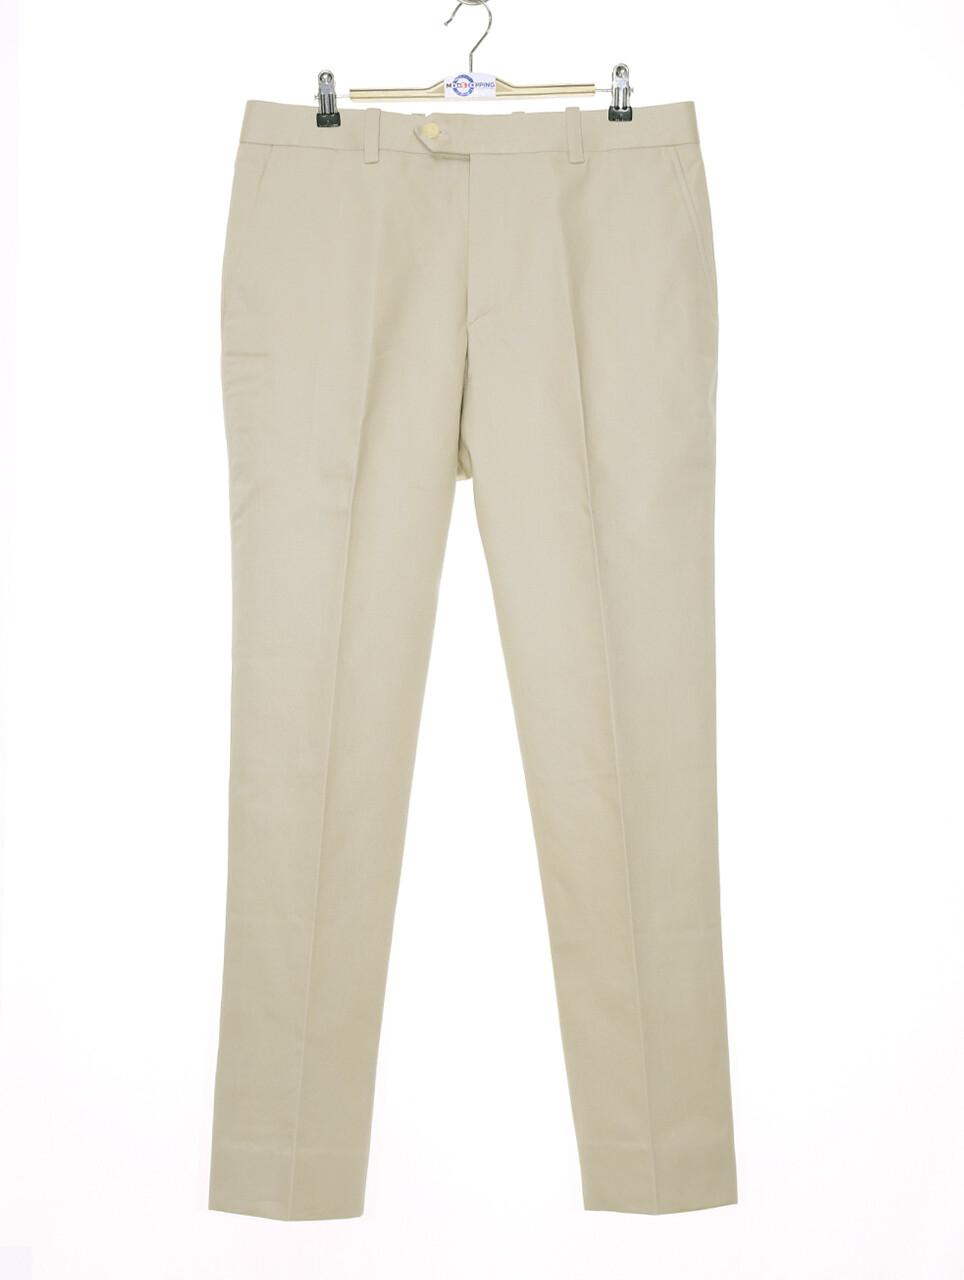 Sta Press Trousers| 60s Mod Classic  Beige Men Trouser